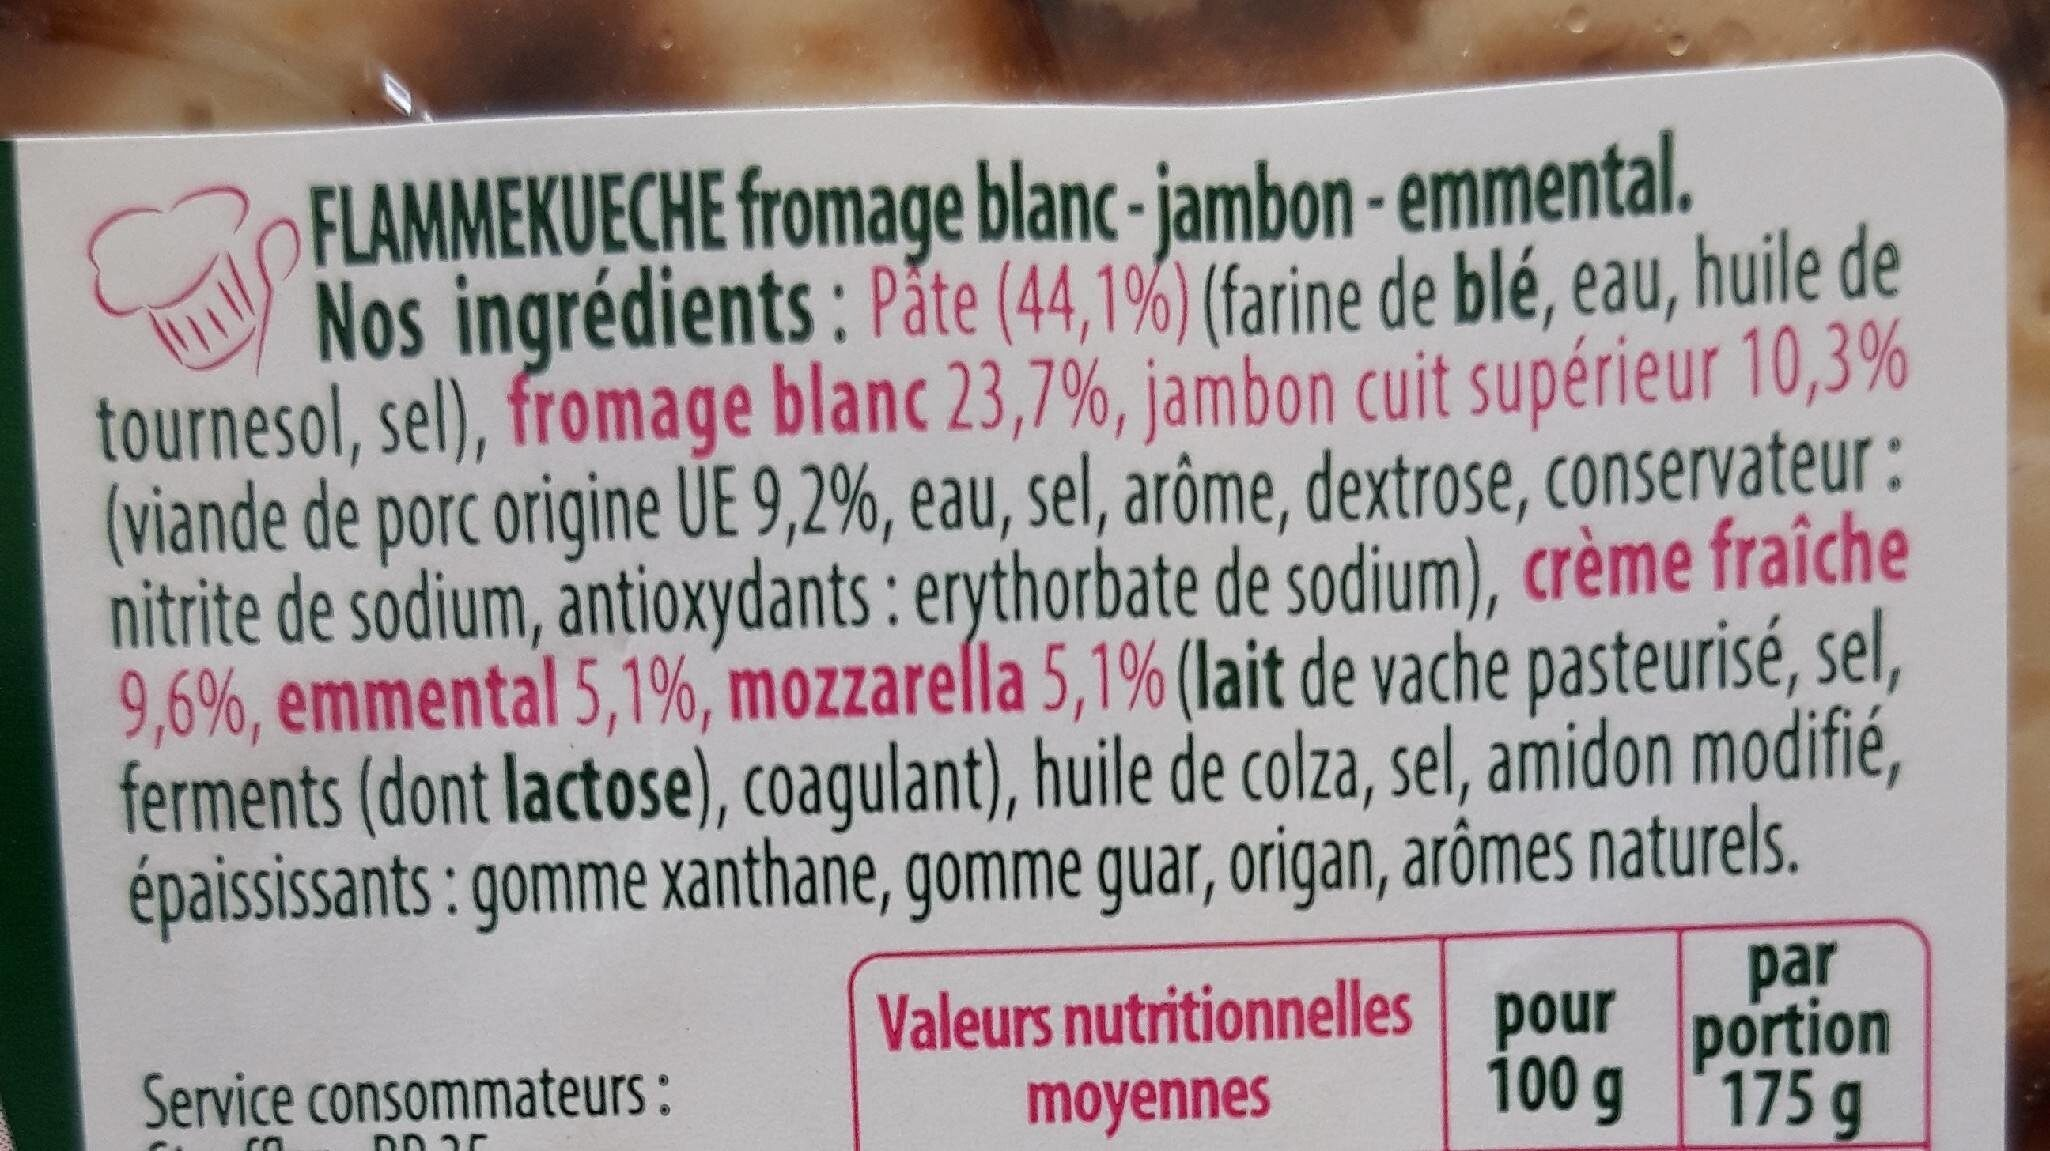 Les idées Flamm jambon emmental - Inhaltsstoffe - fr